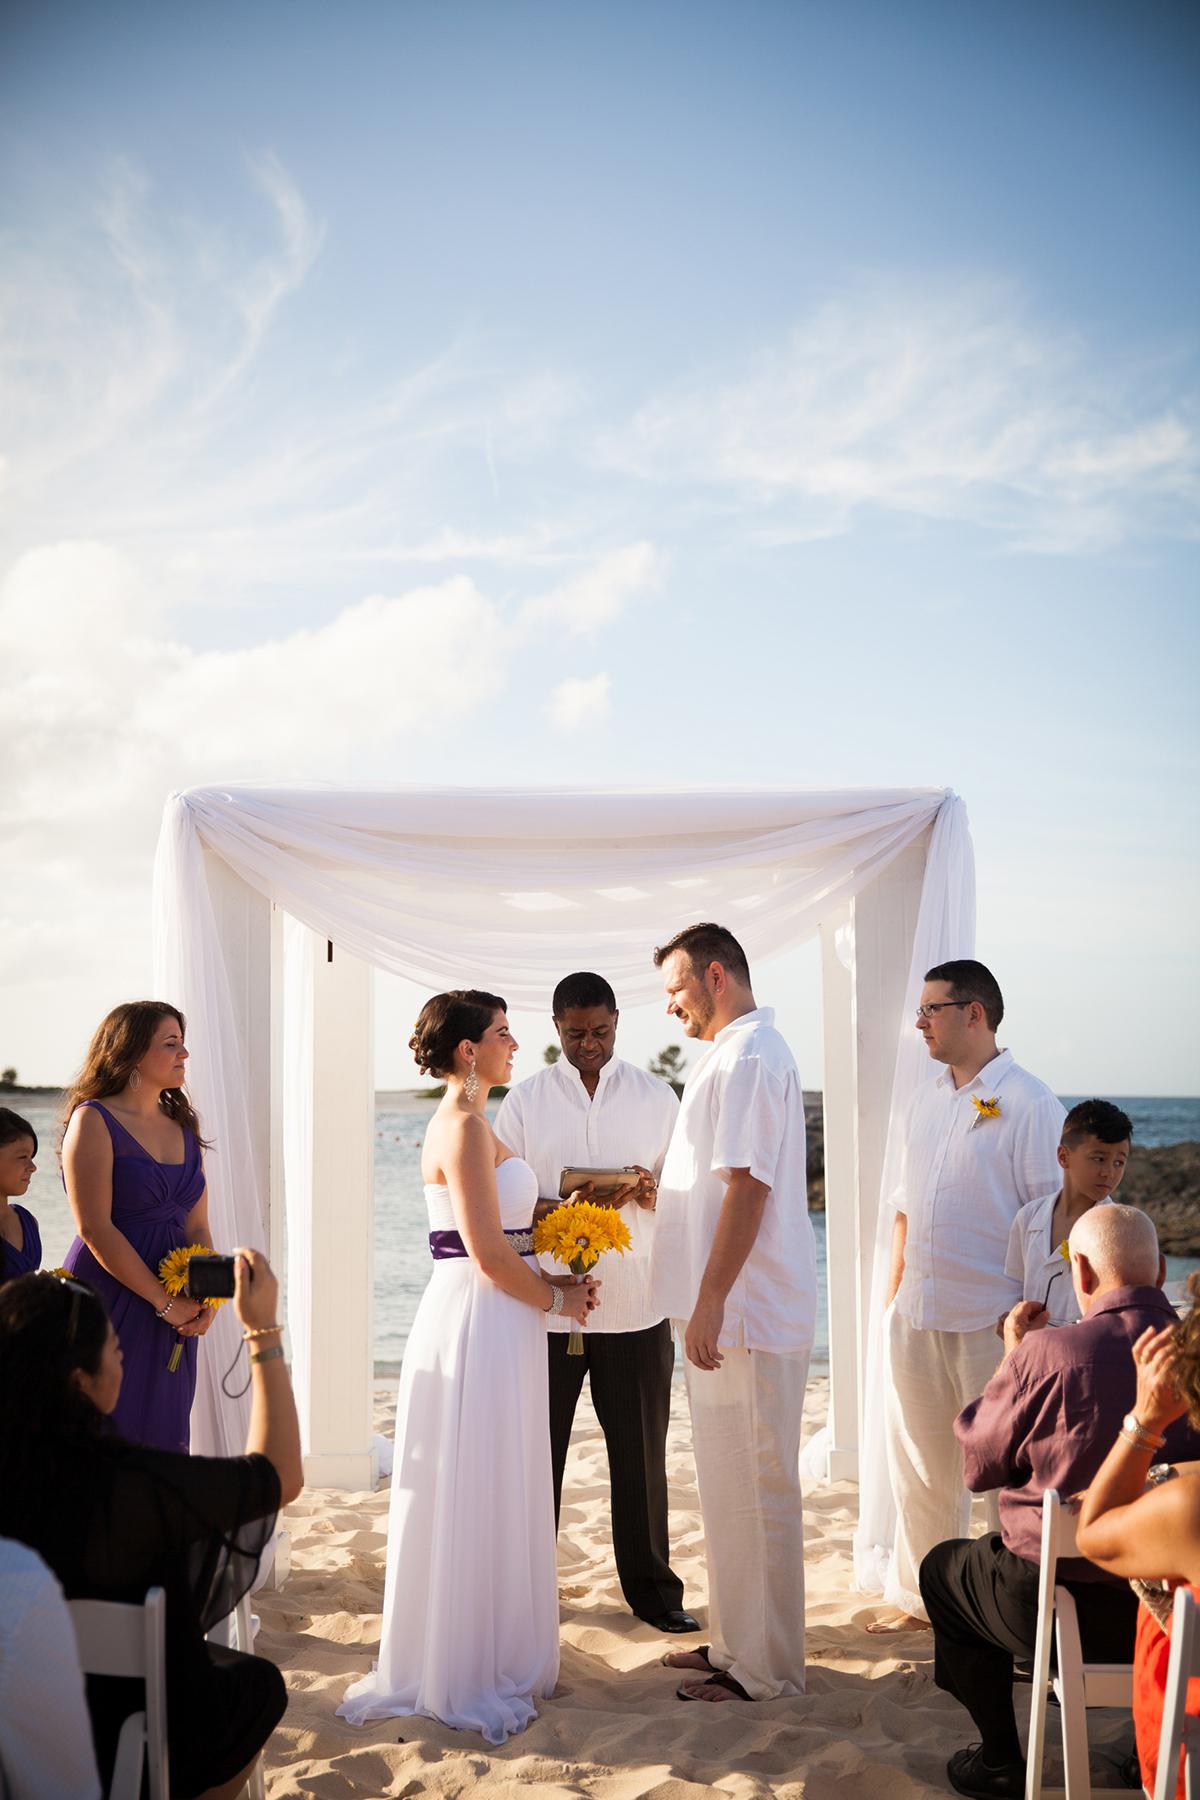 Daniela-Edvard_wedding_Dukat-Photos-1211.jpg